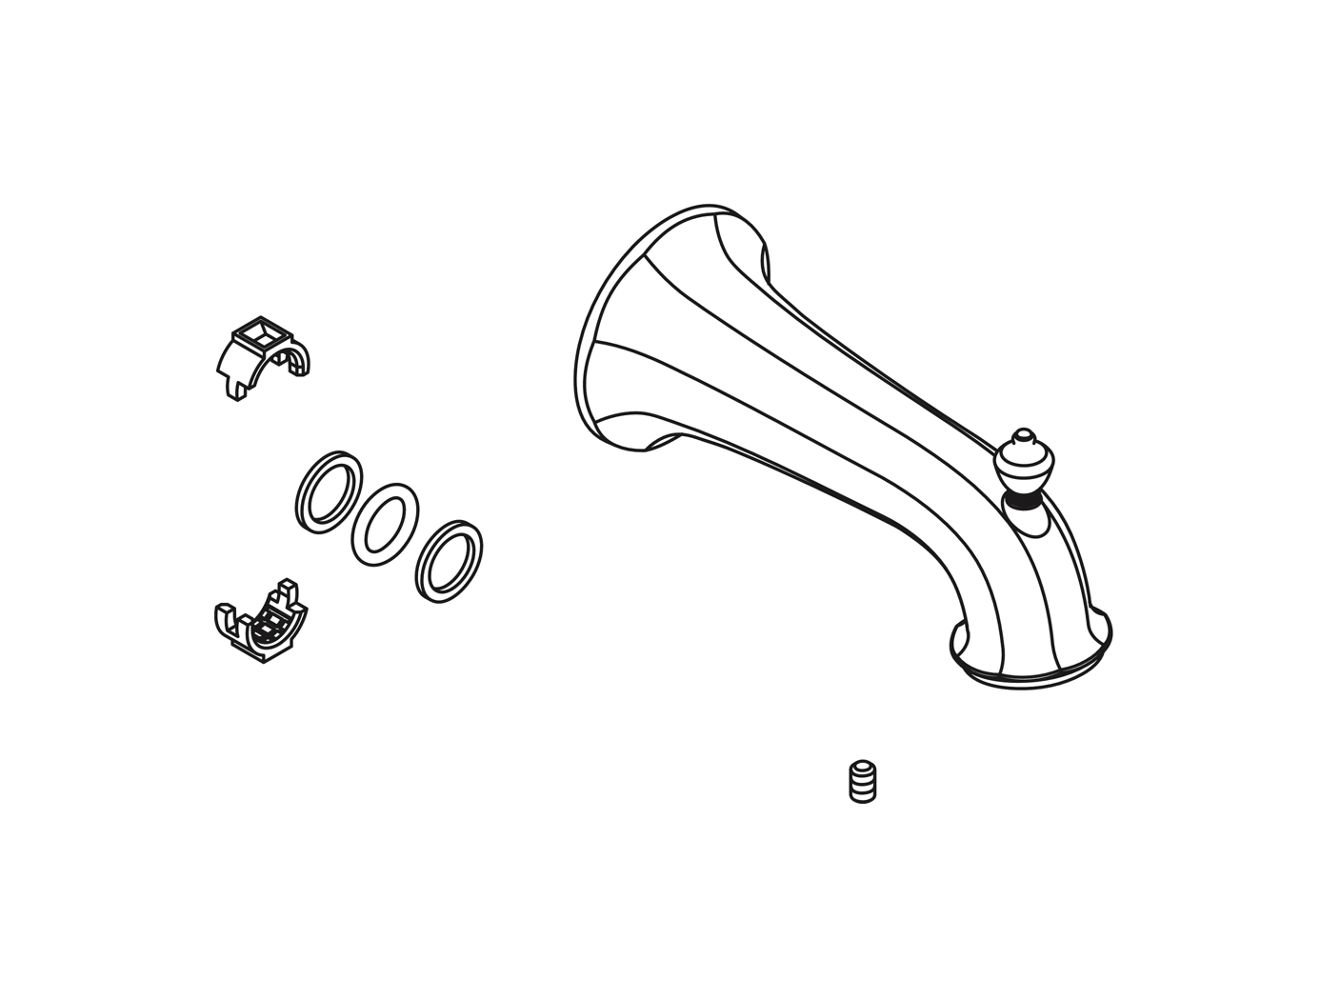 Kohler 1097031-CP Replacement Part by Kohler